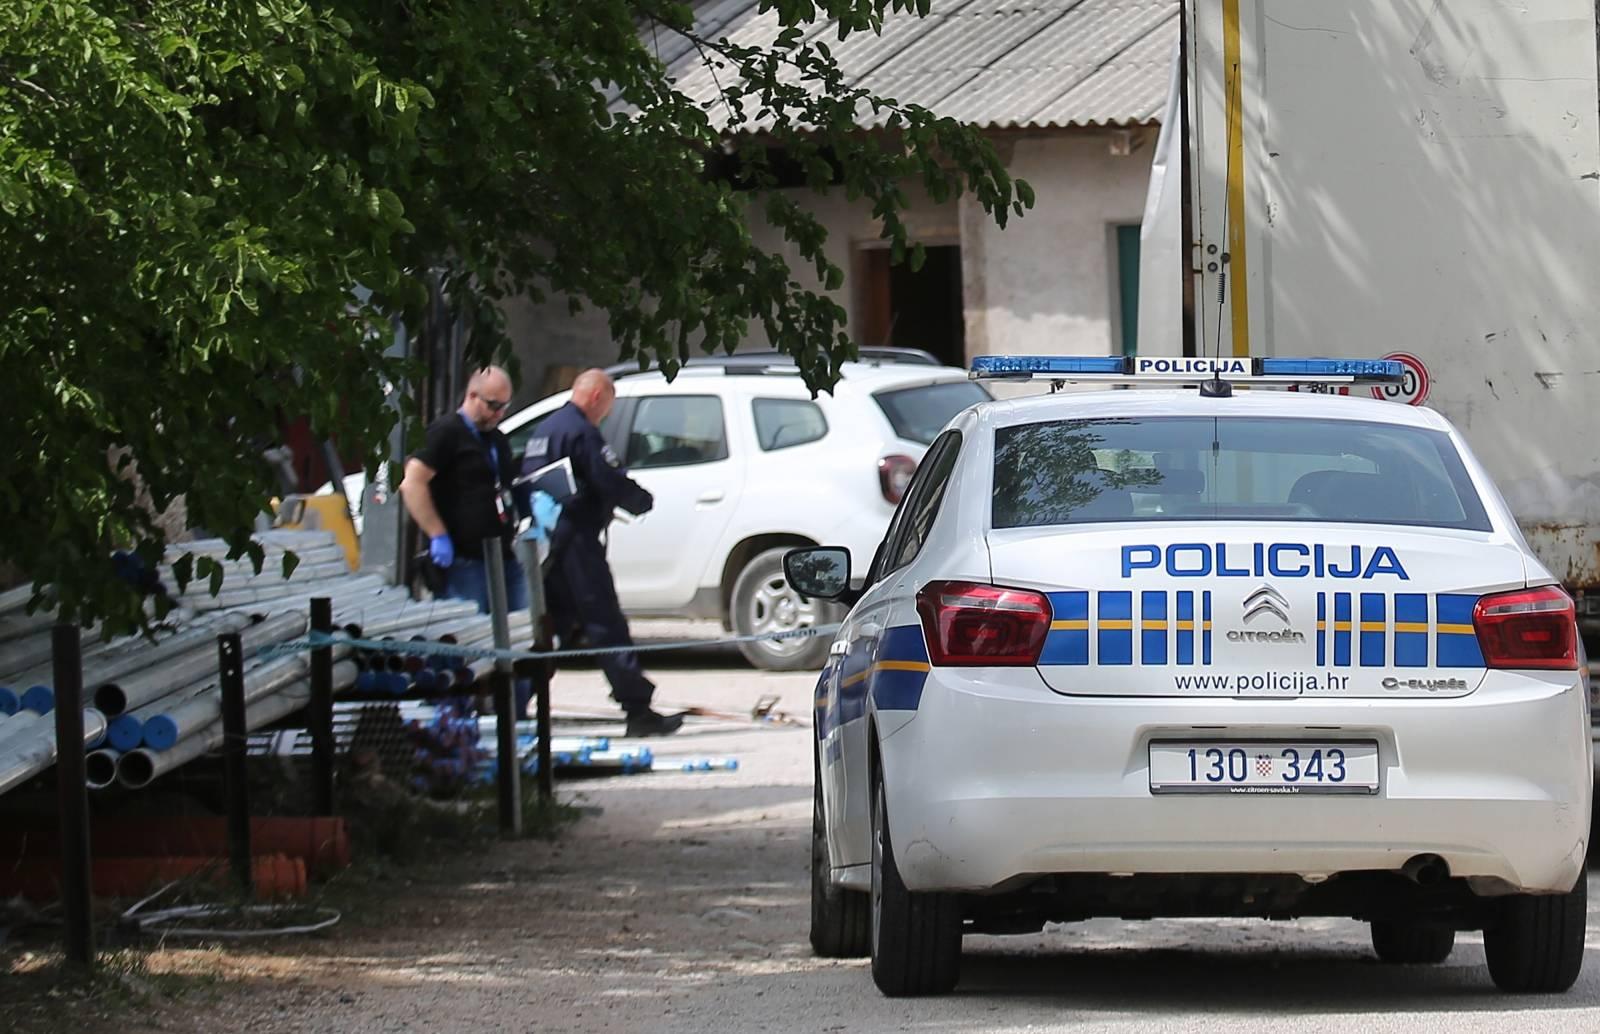 Šibenik: Prilikom istovara tereta u Vodovodu jedna osoba smrtno stradala